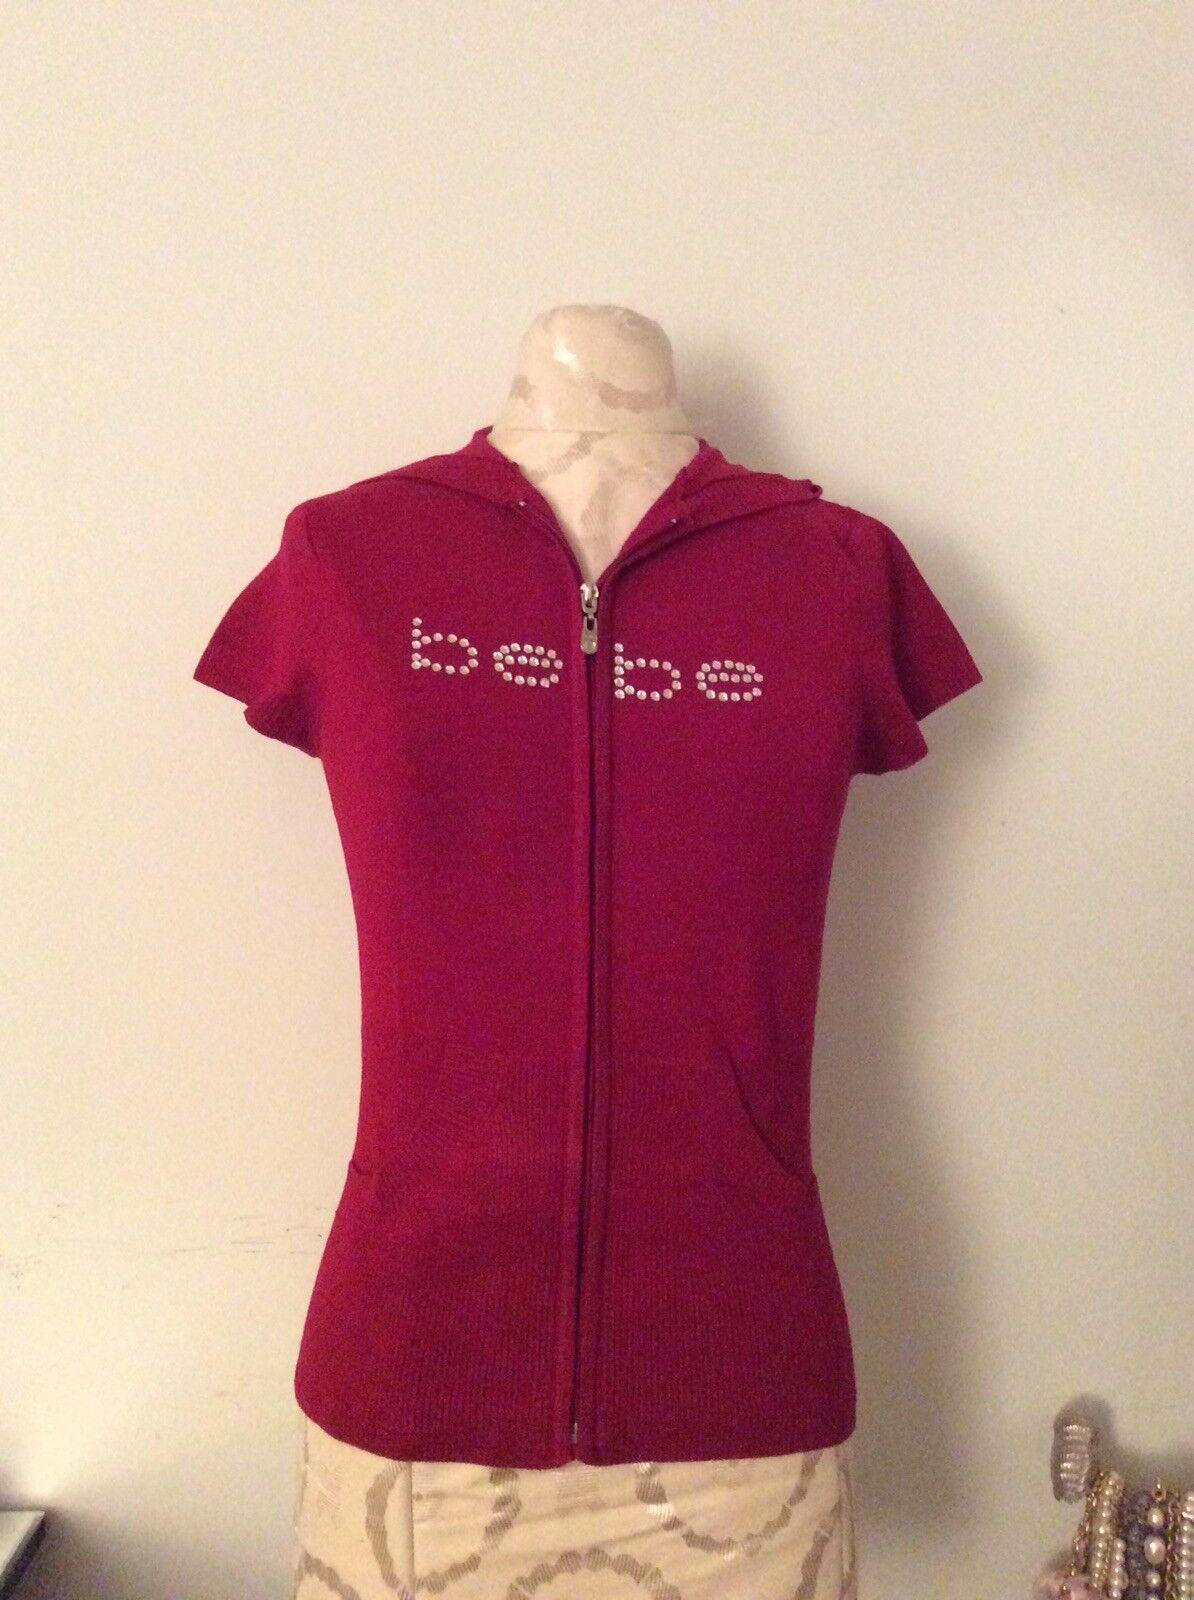 New Bebe Women Red Sweater Bebe Rhinestones Tight Fitting Zip Hoodie SZ L